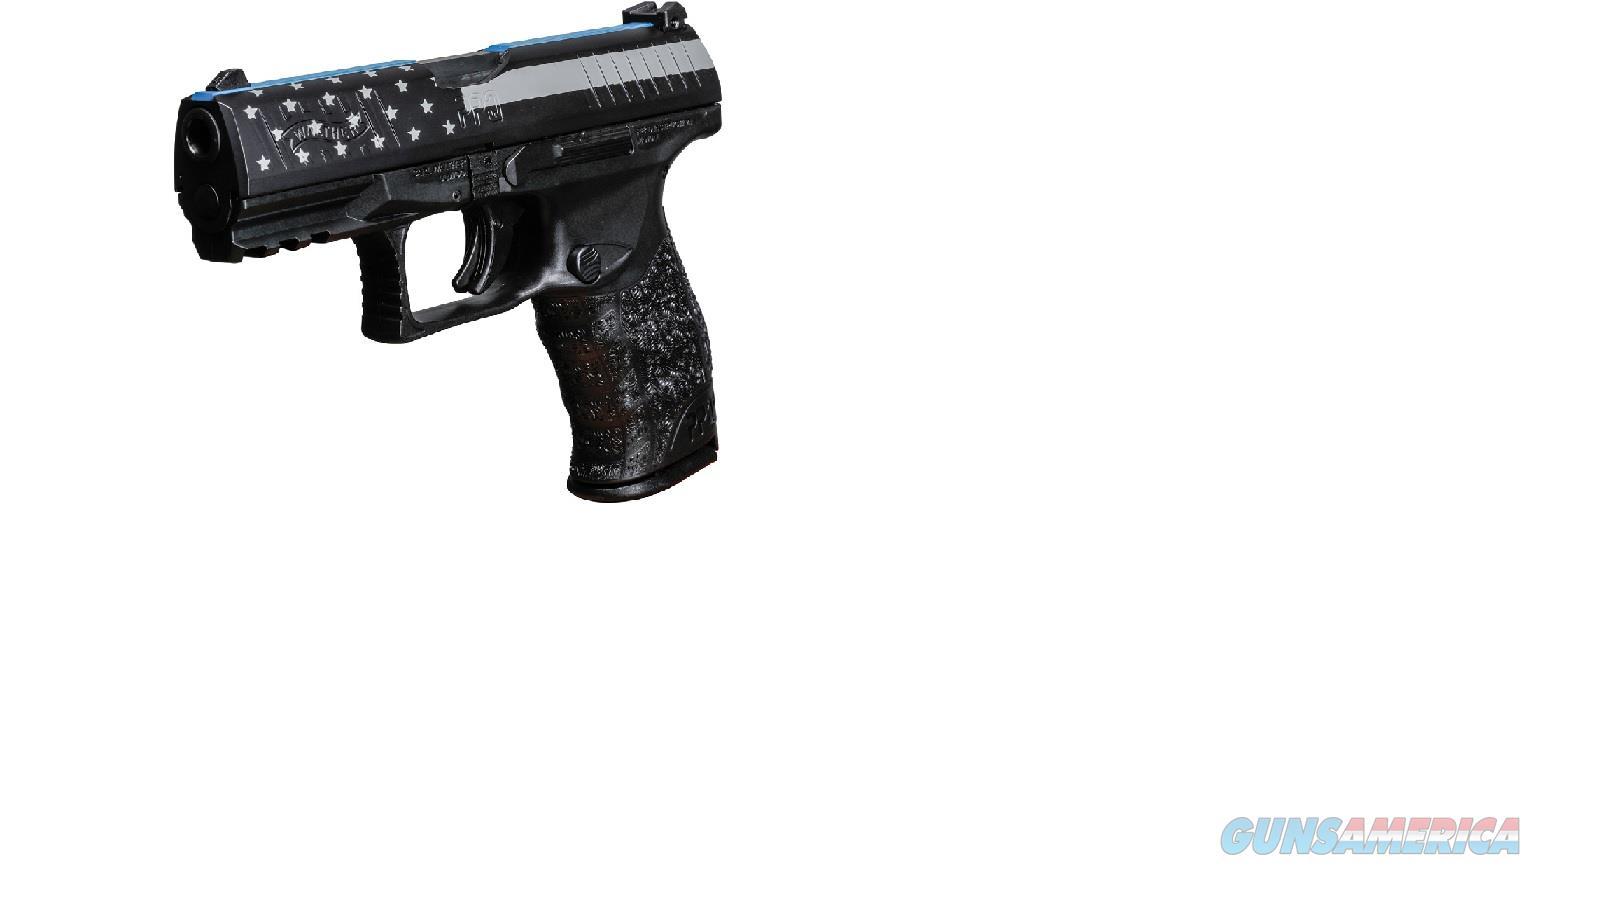 "2796066BL Walther Blue Line PPQ M2 4""- 9mm   Guns > Pistols > Walther Pistols > Post WWII > P99/PPQ"